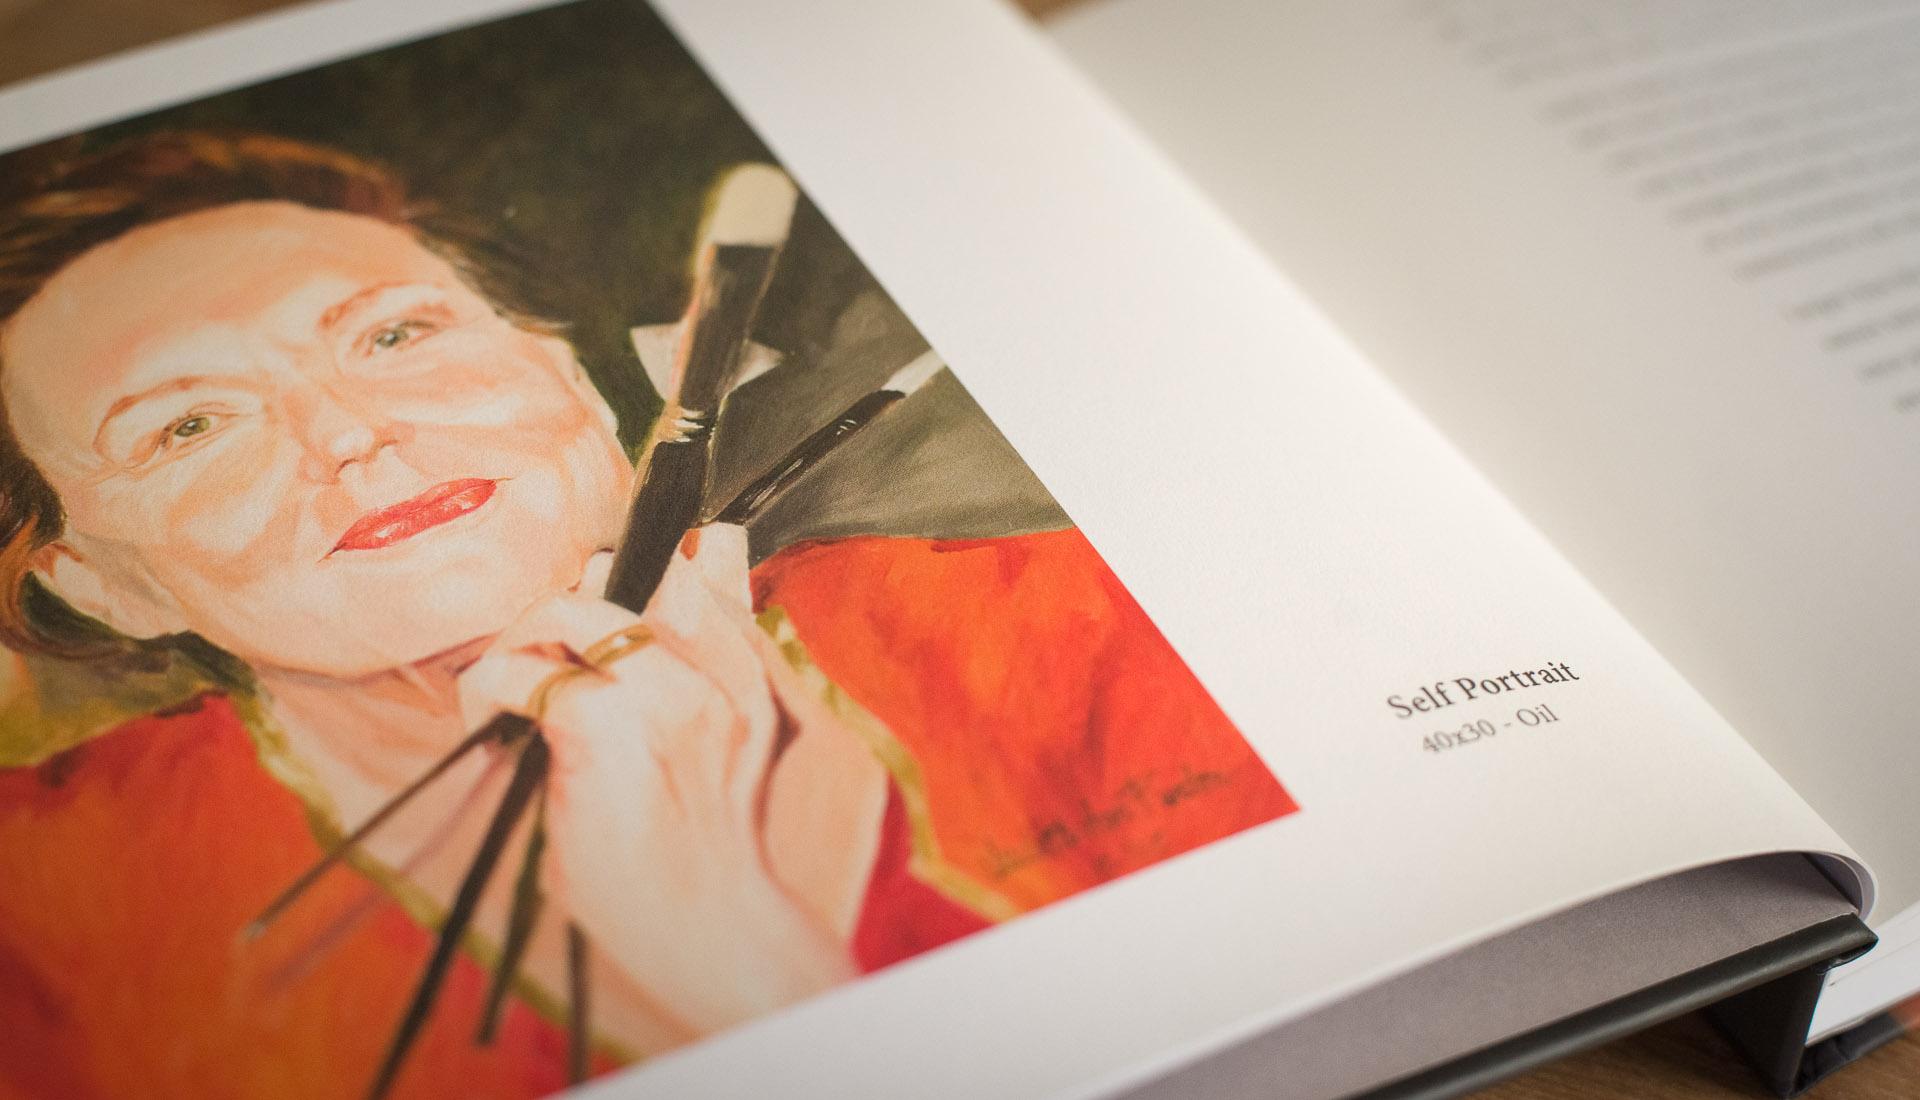 judith-book-6432